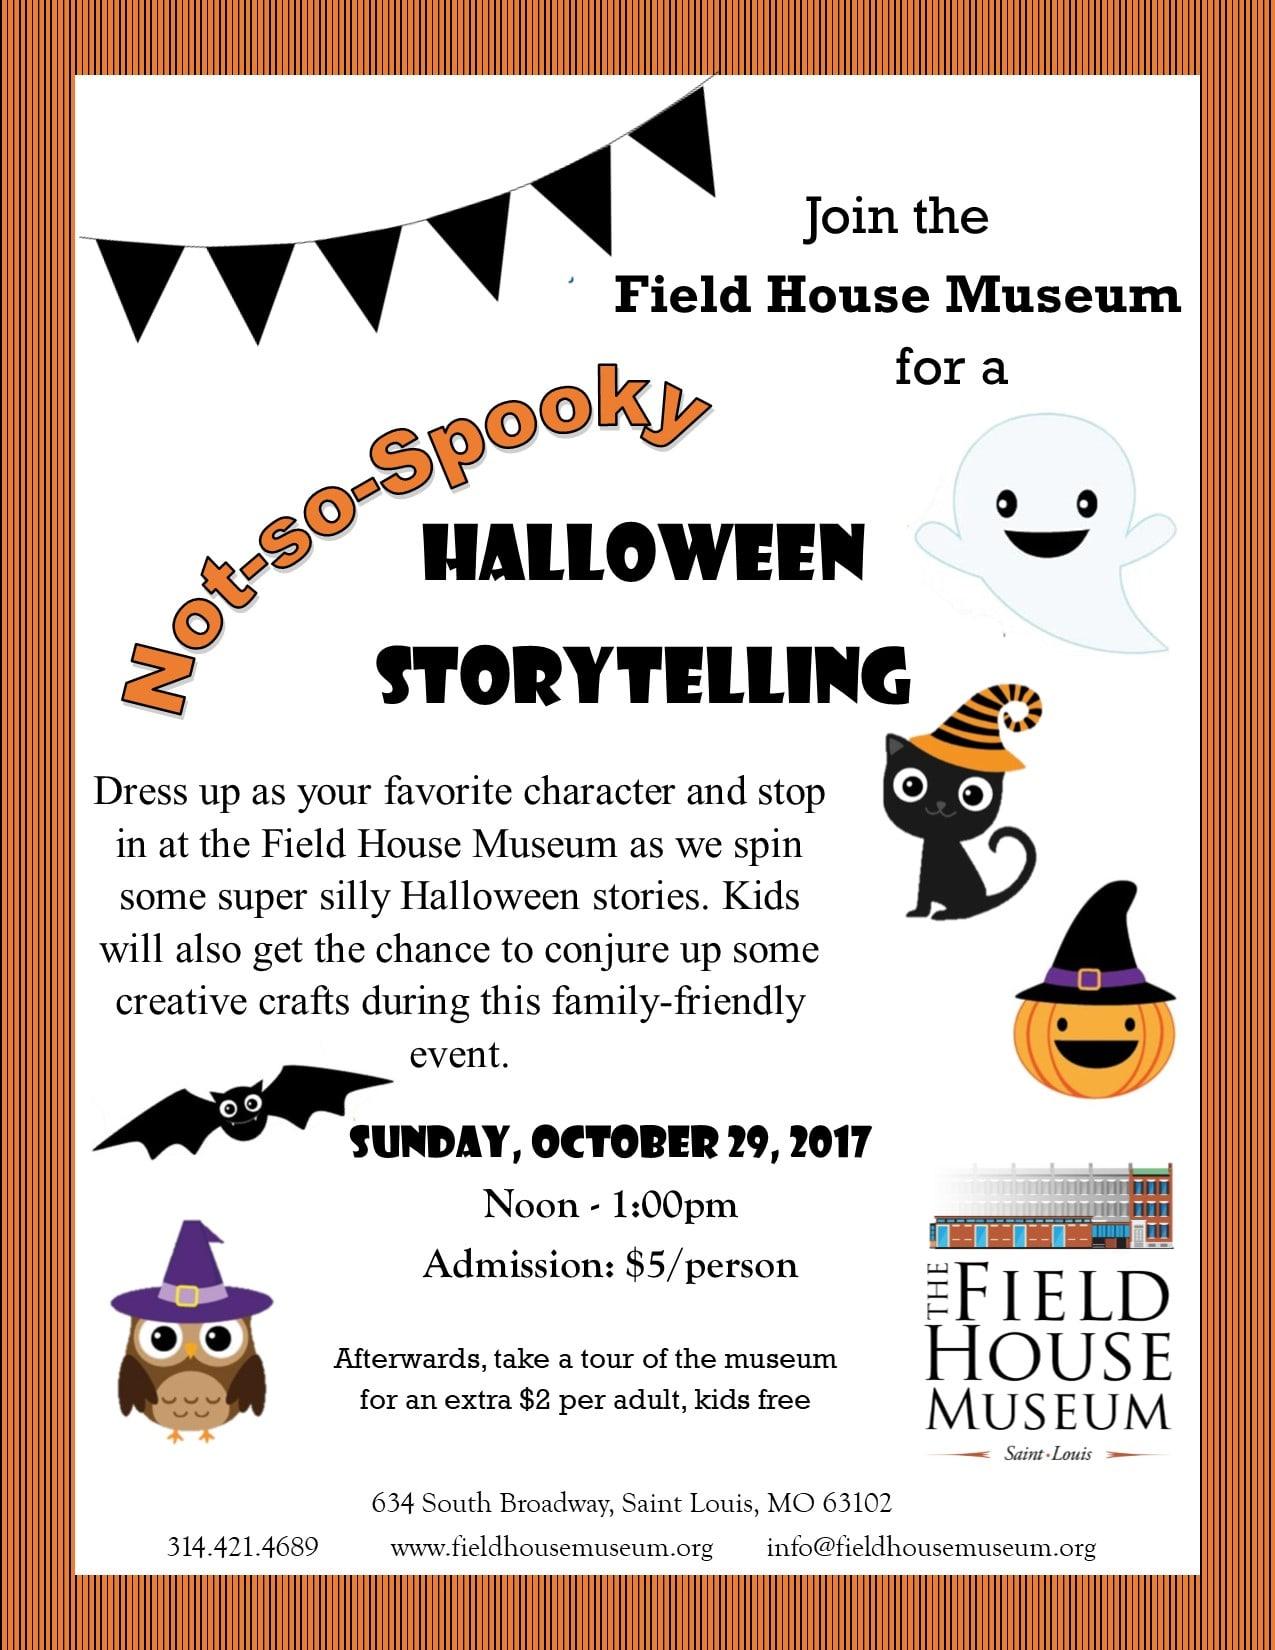 Not So Spooky Halloween Storytelling